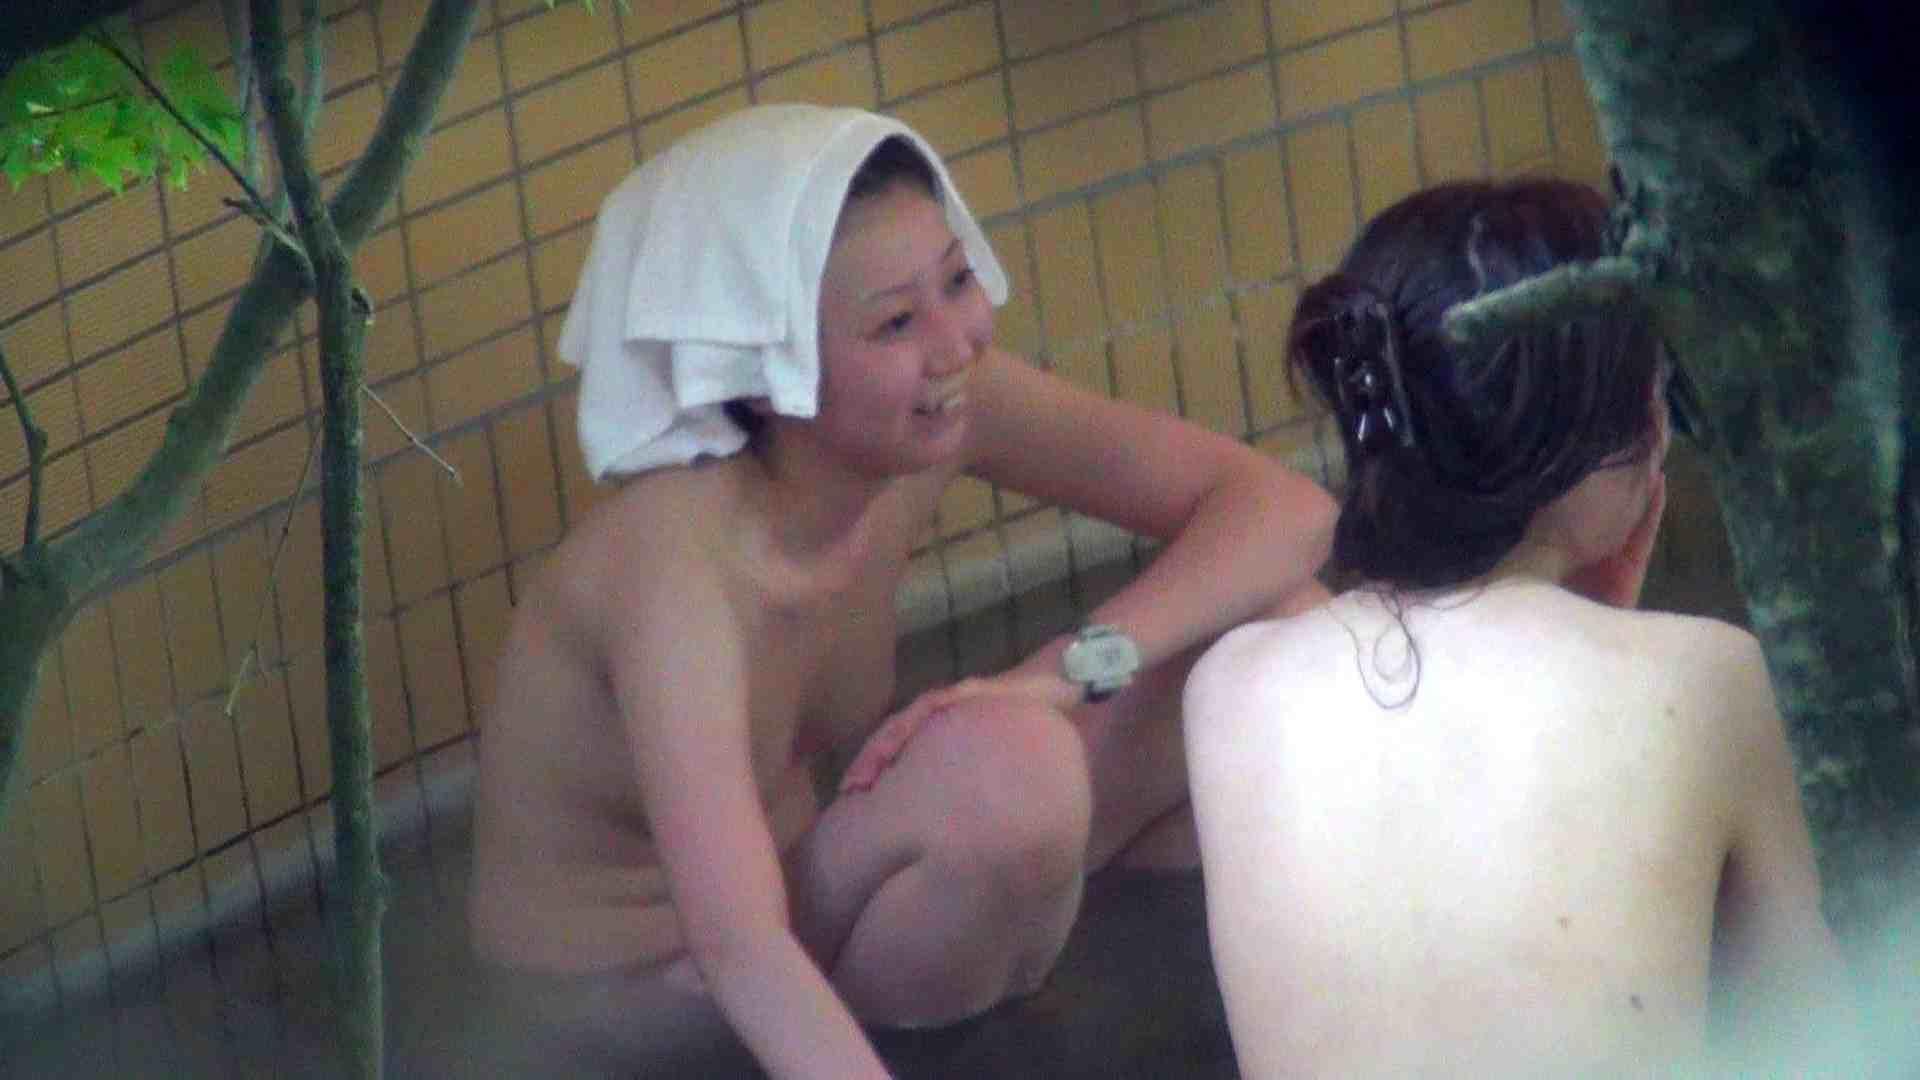 Vol.44 アラサー三人露天風呂女子会開催中 美女 エロ無料画像 112画像 110